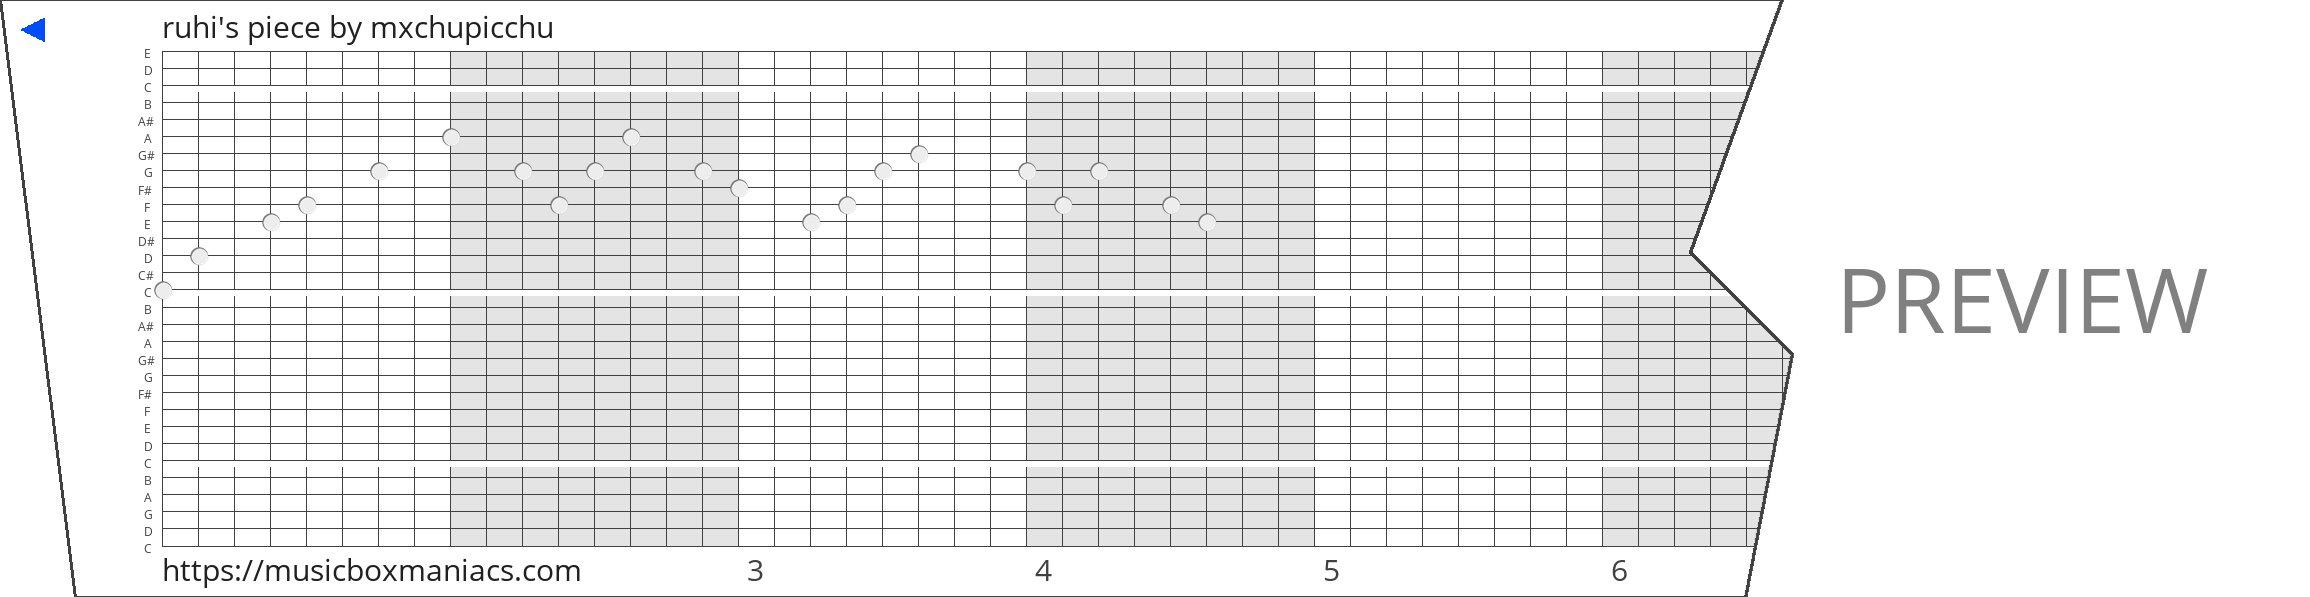 ruhi's piece 30 note music box paper strip